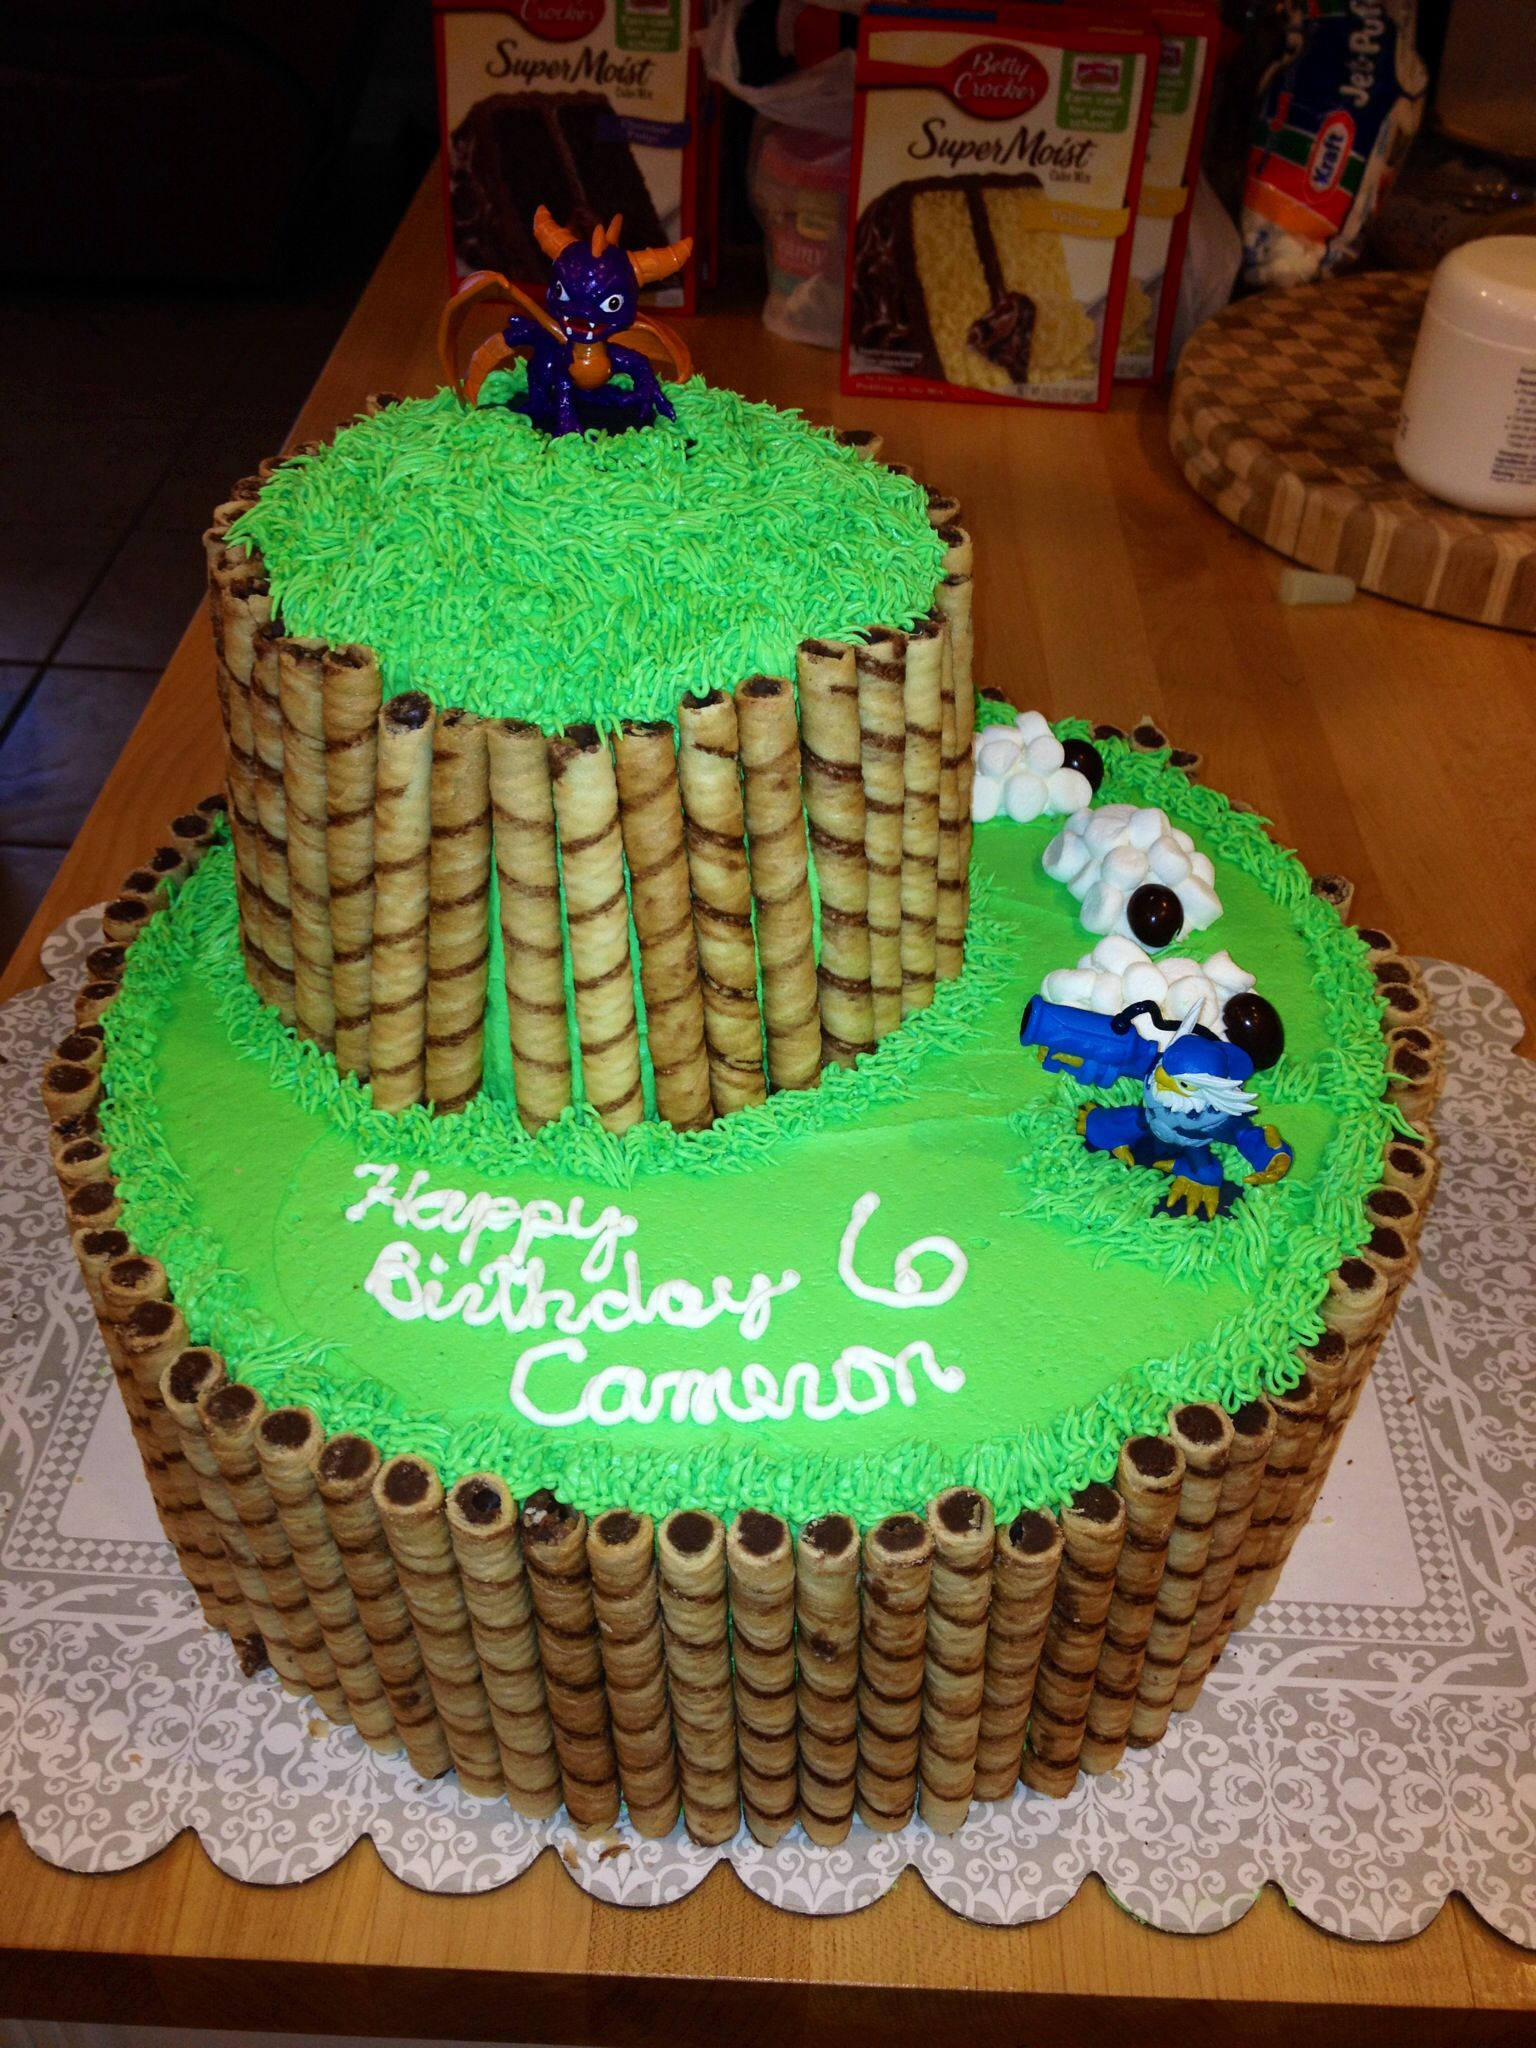 Cameron's birthday